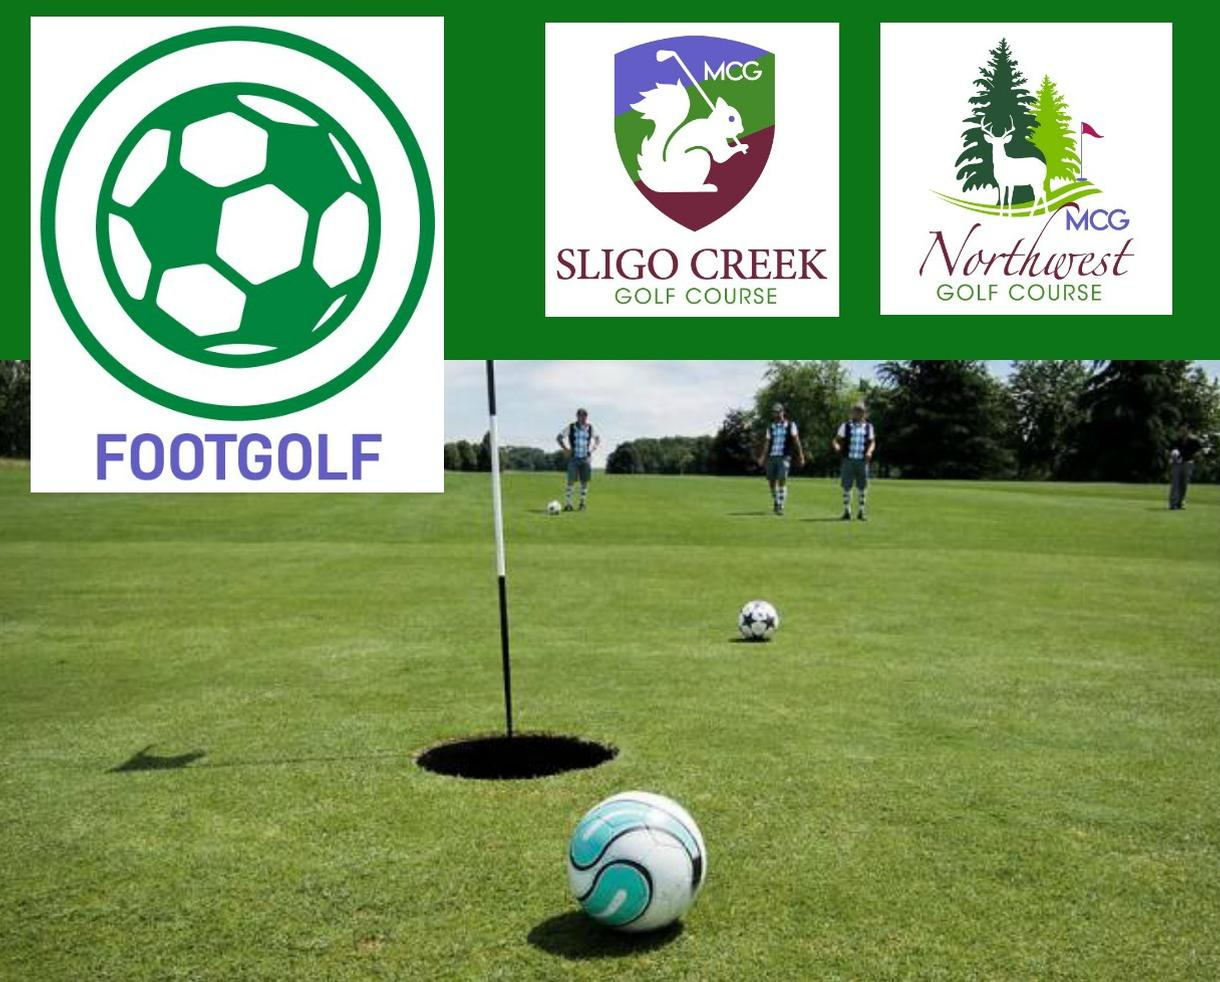 MCG Footgolf at Northwest or Sligo Creek Golf Course